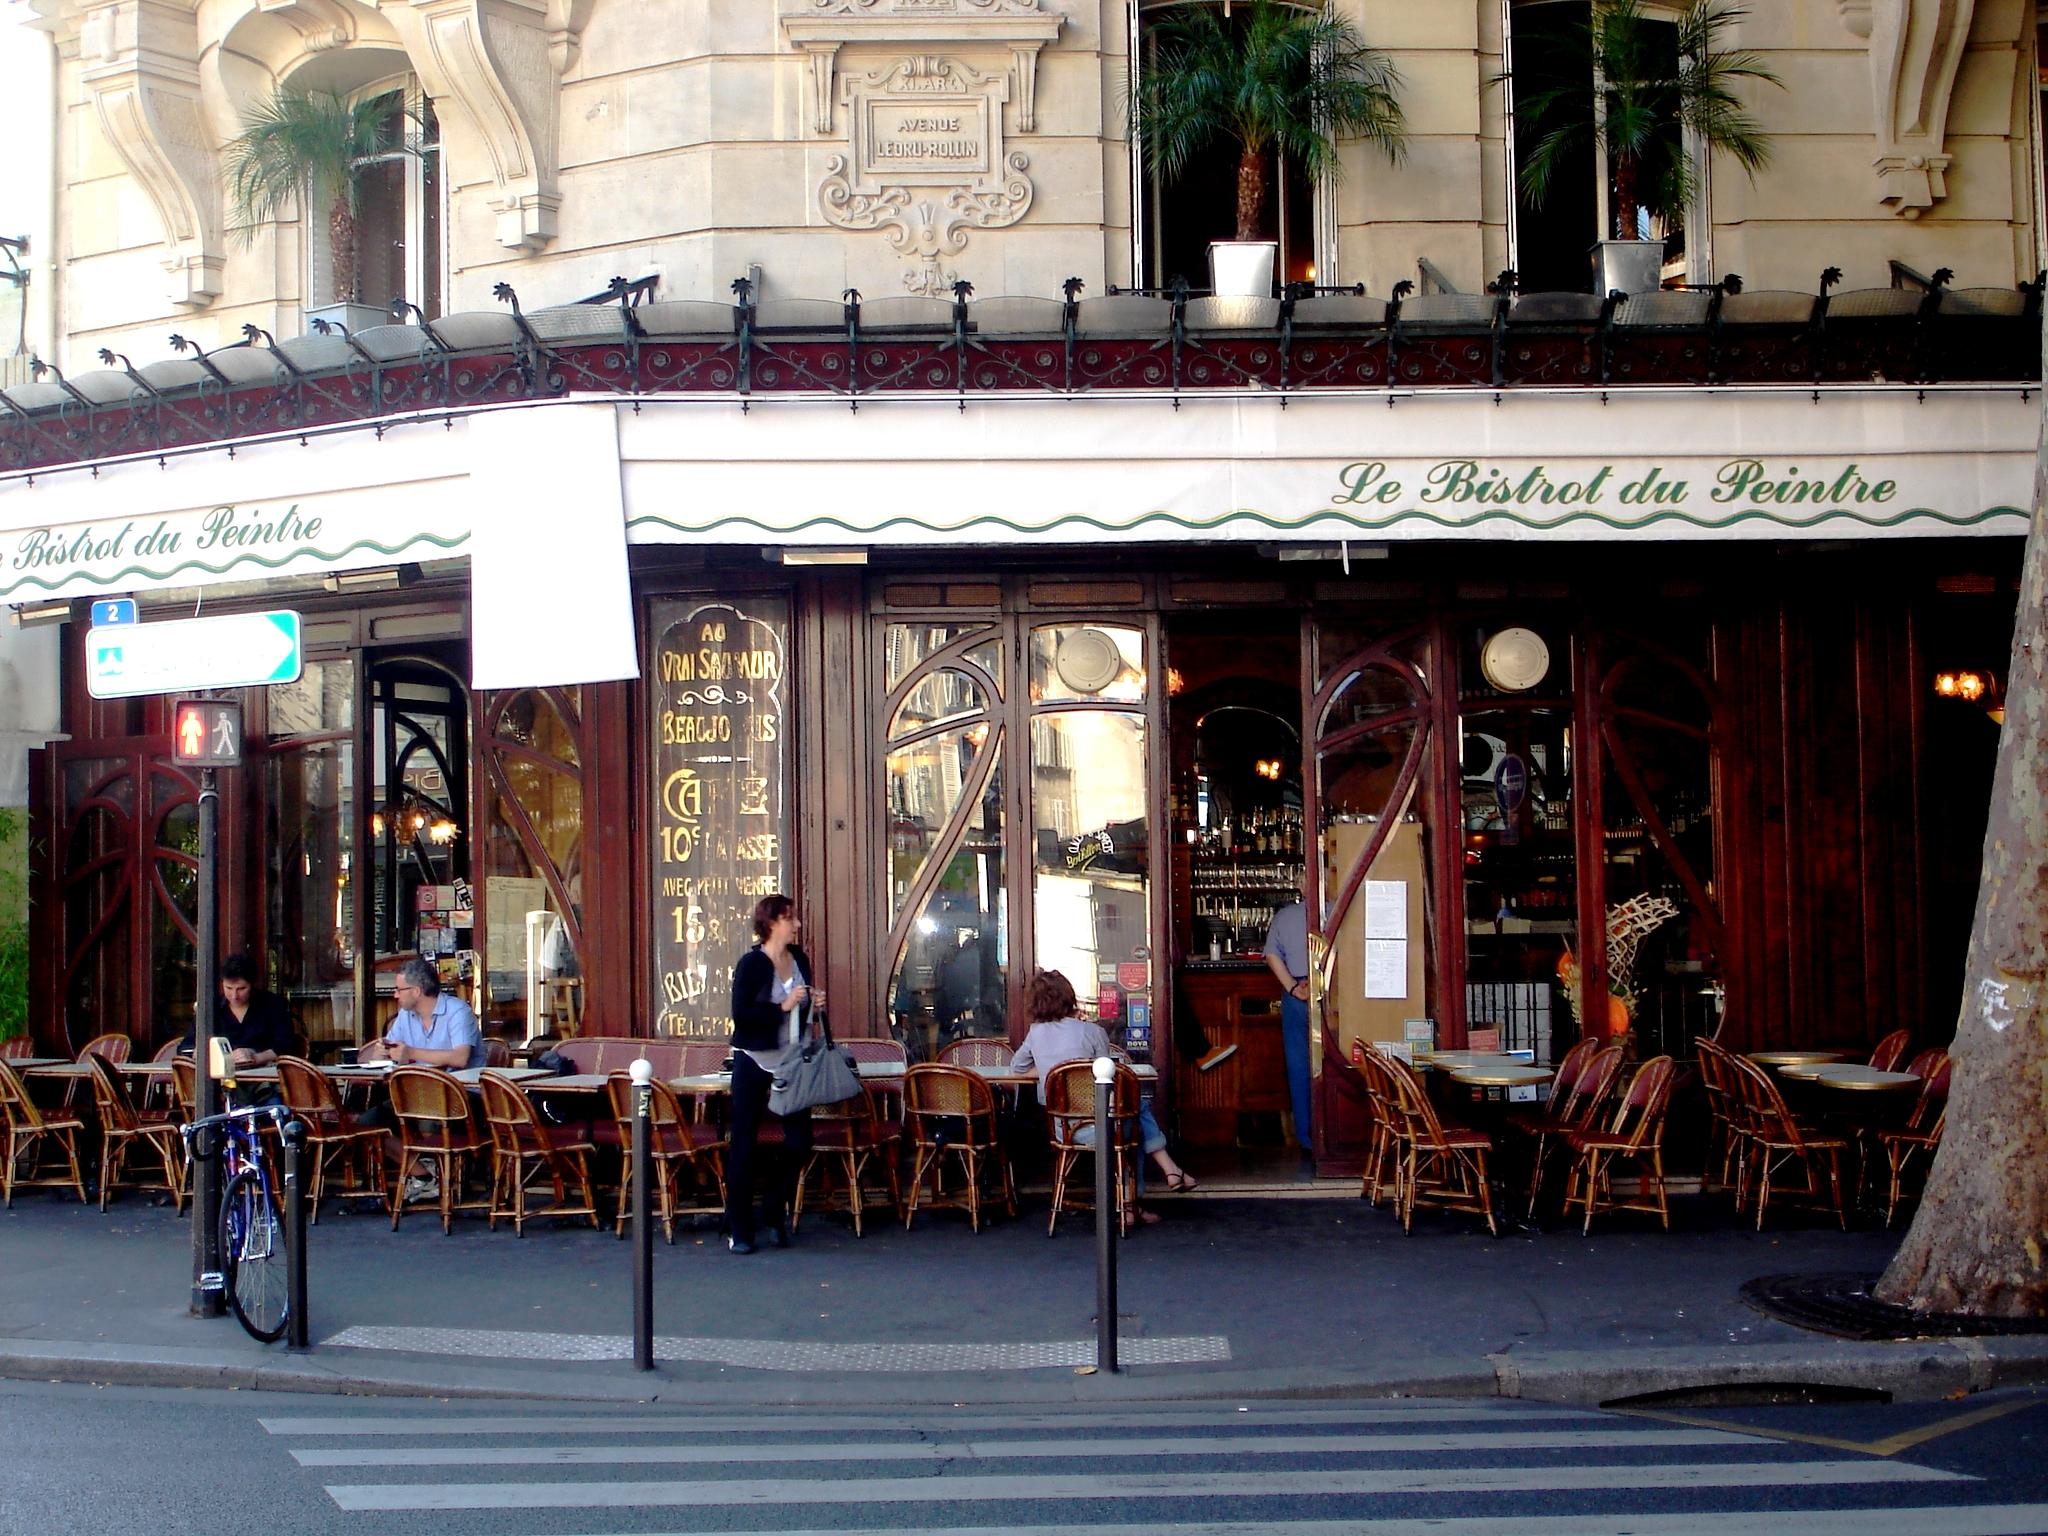 Restaurant Au Bistrot Du March Ef Bf Bd Saint Germain En Laye